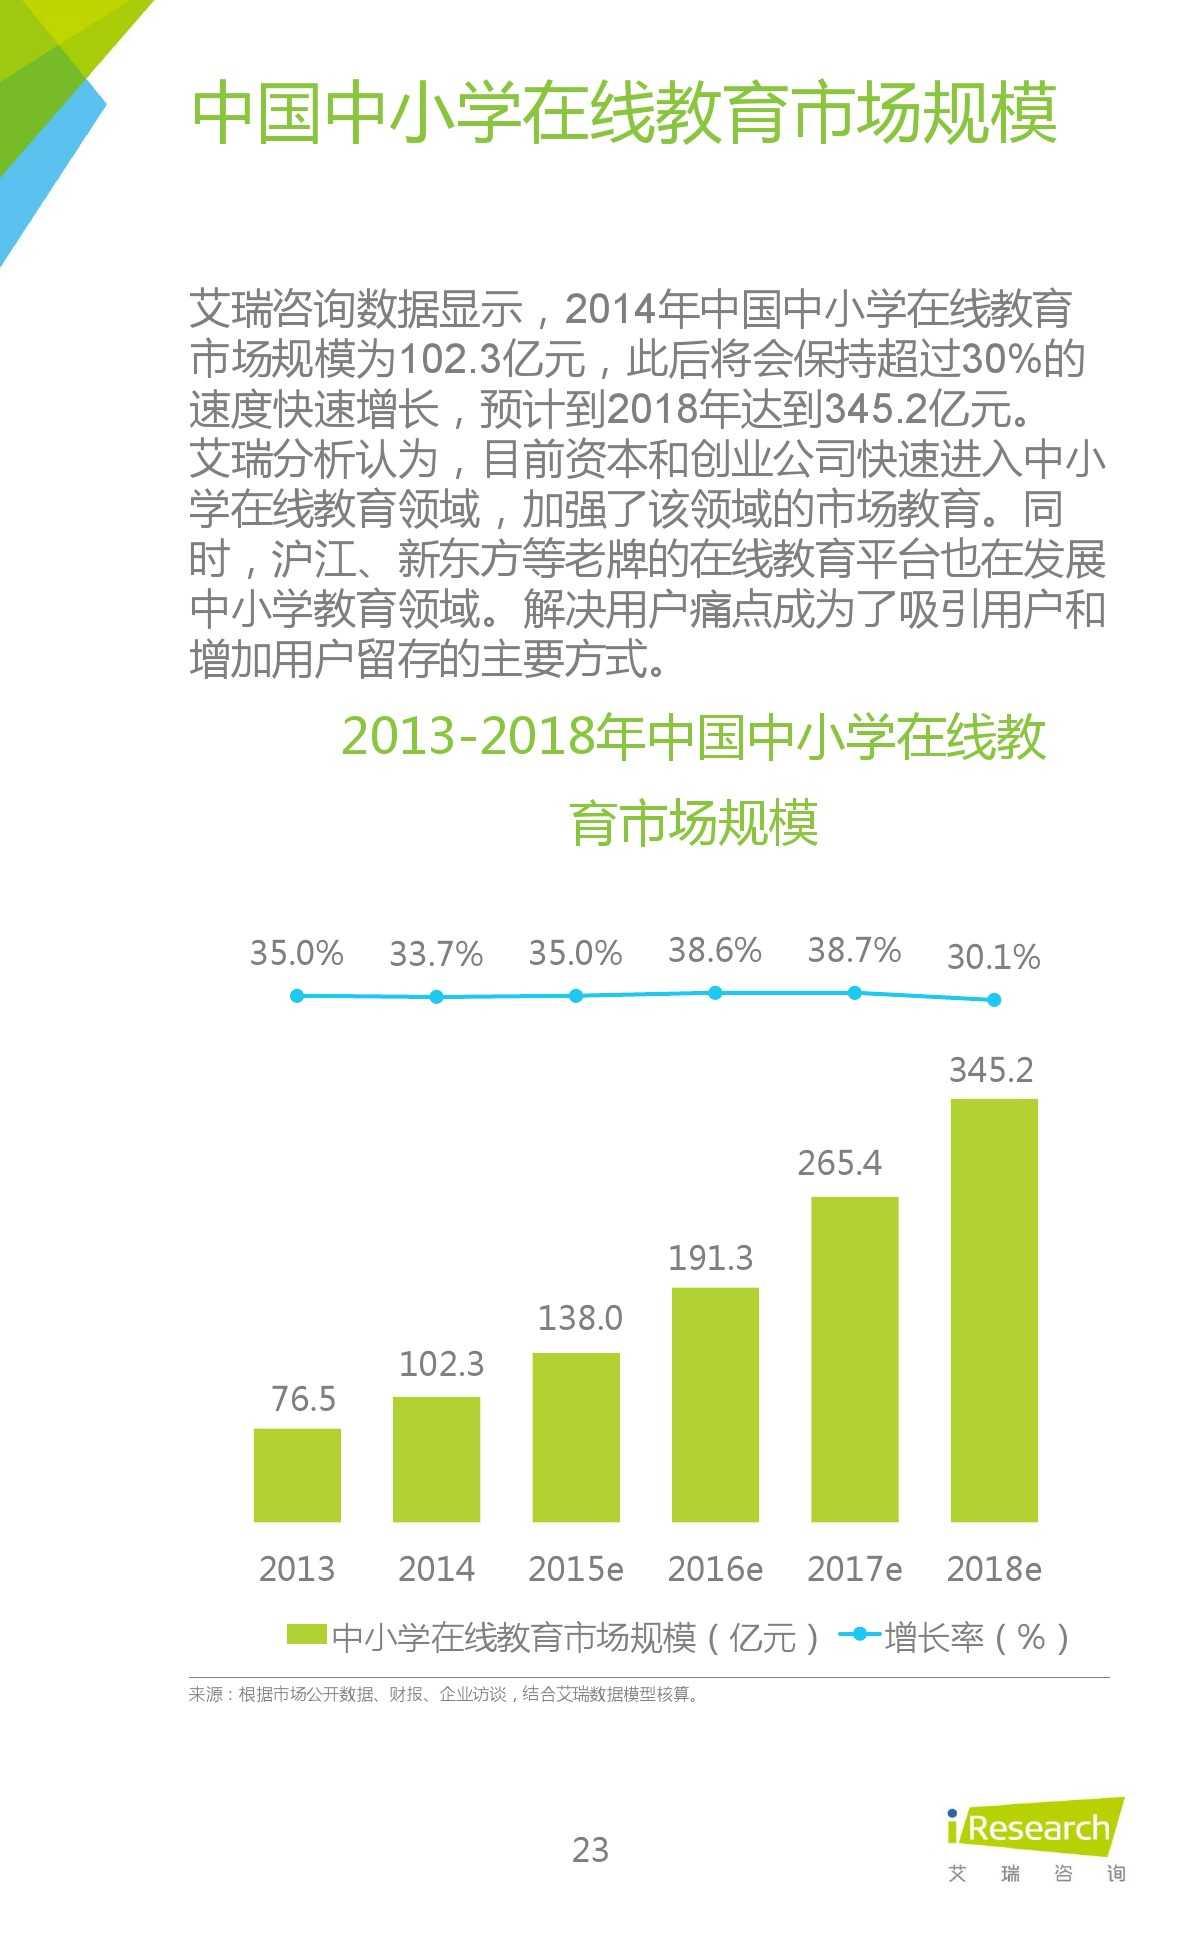 iResearch-2015年中国在线教育平台研究报告_000023